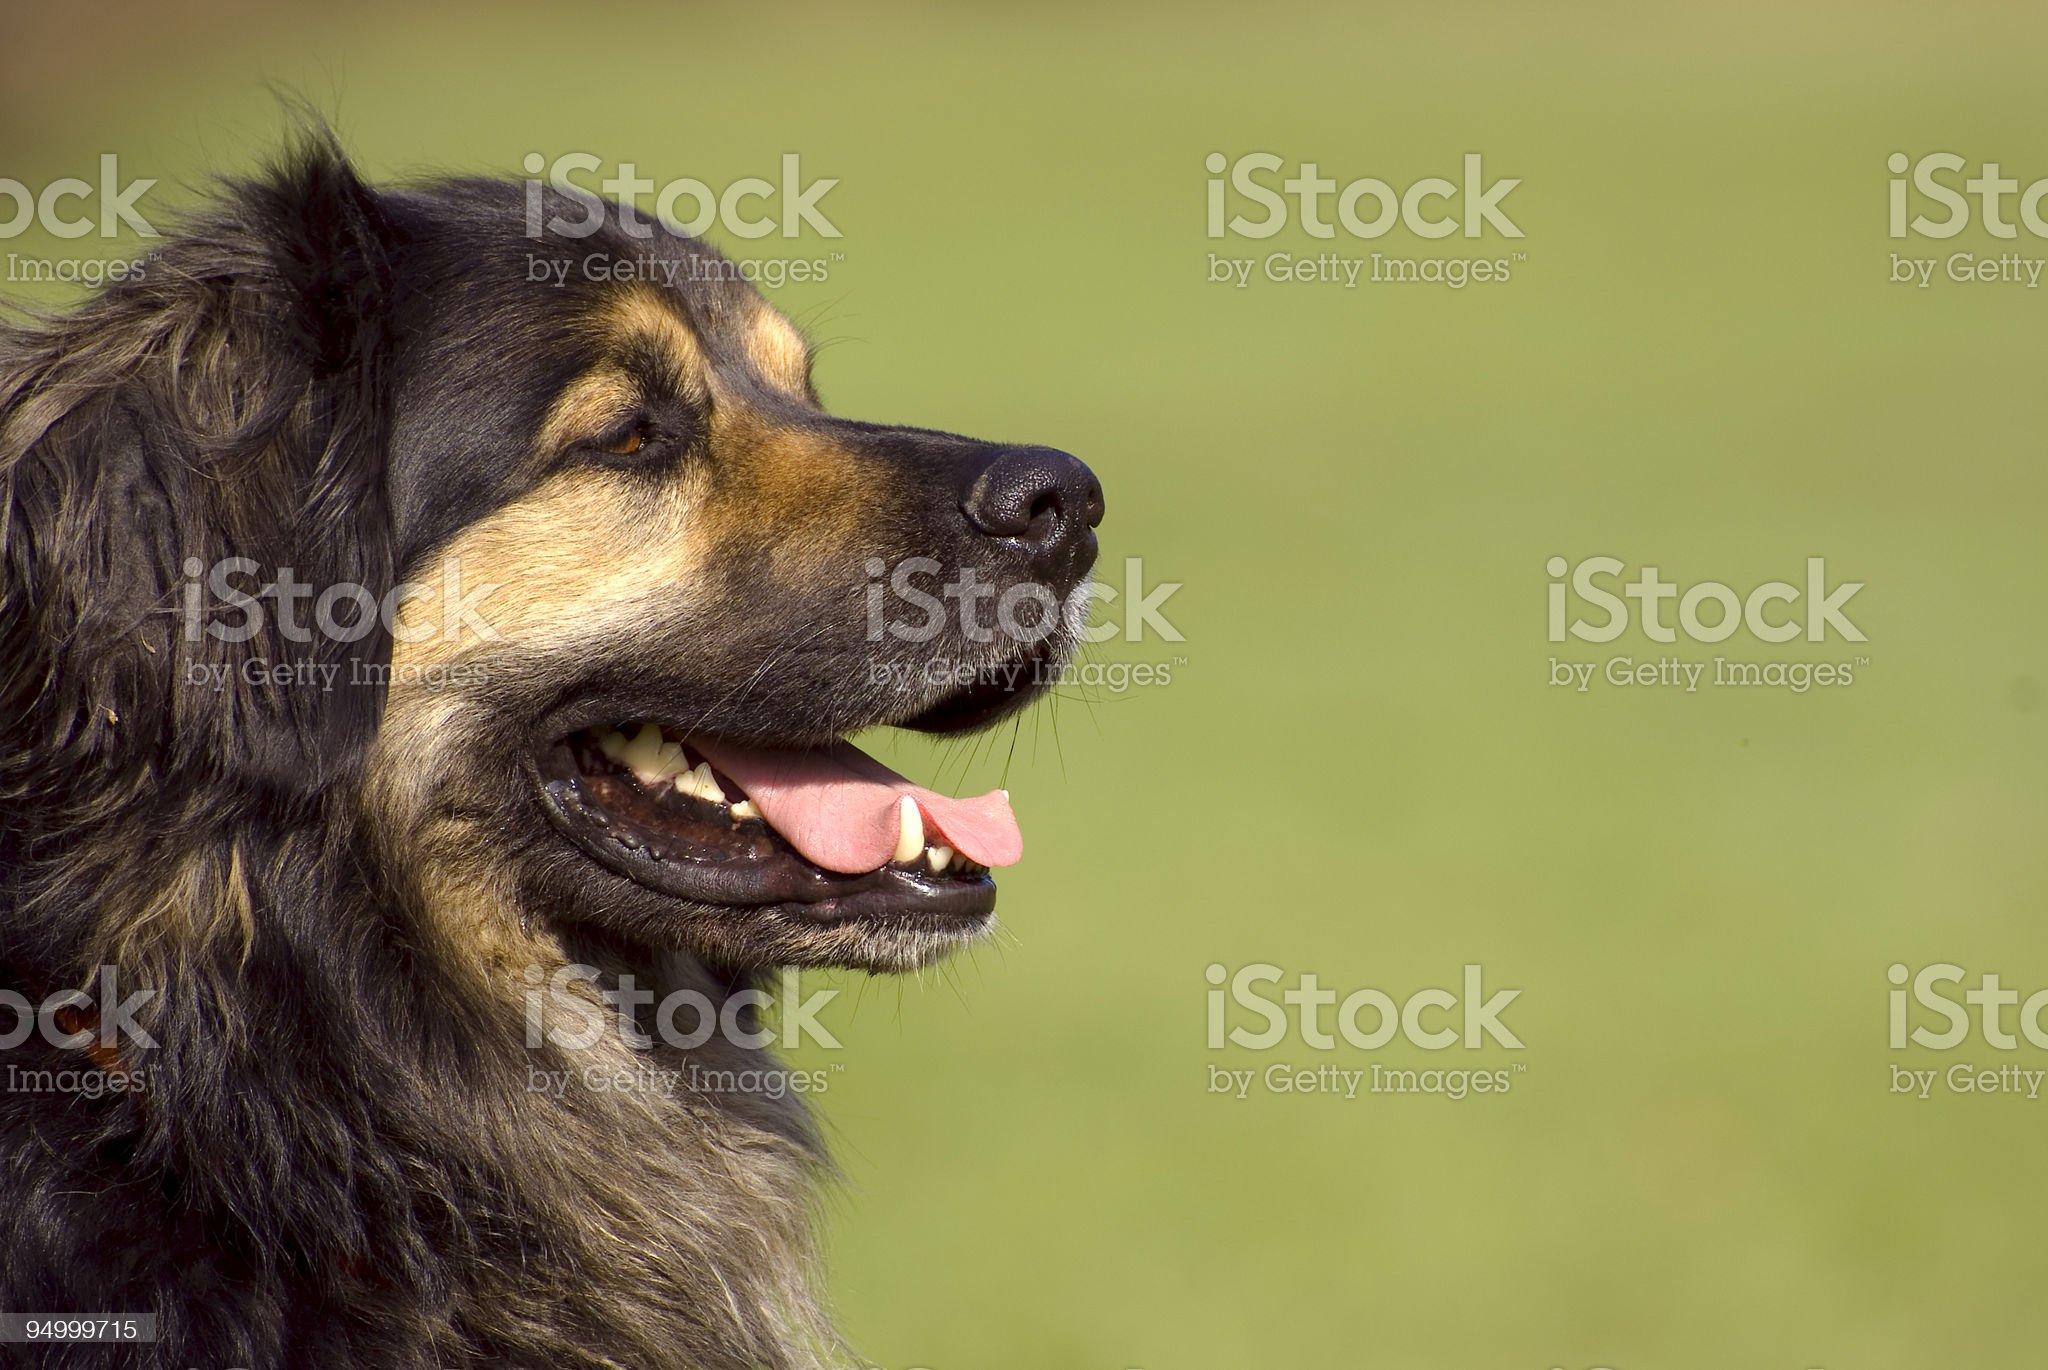 dog portrait royalty-free stock photo